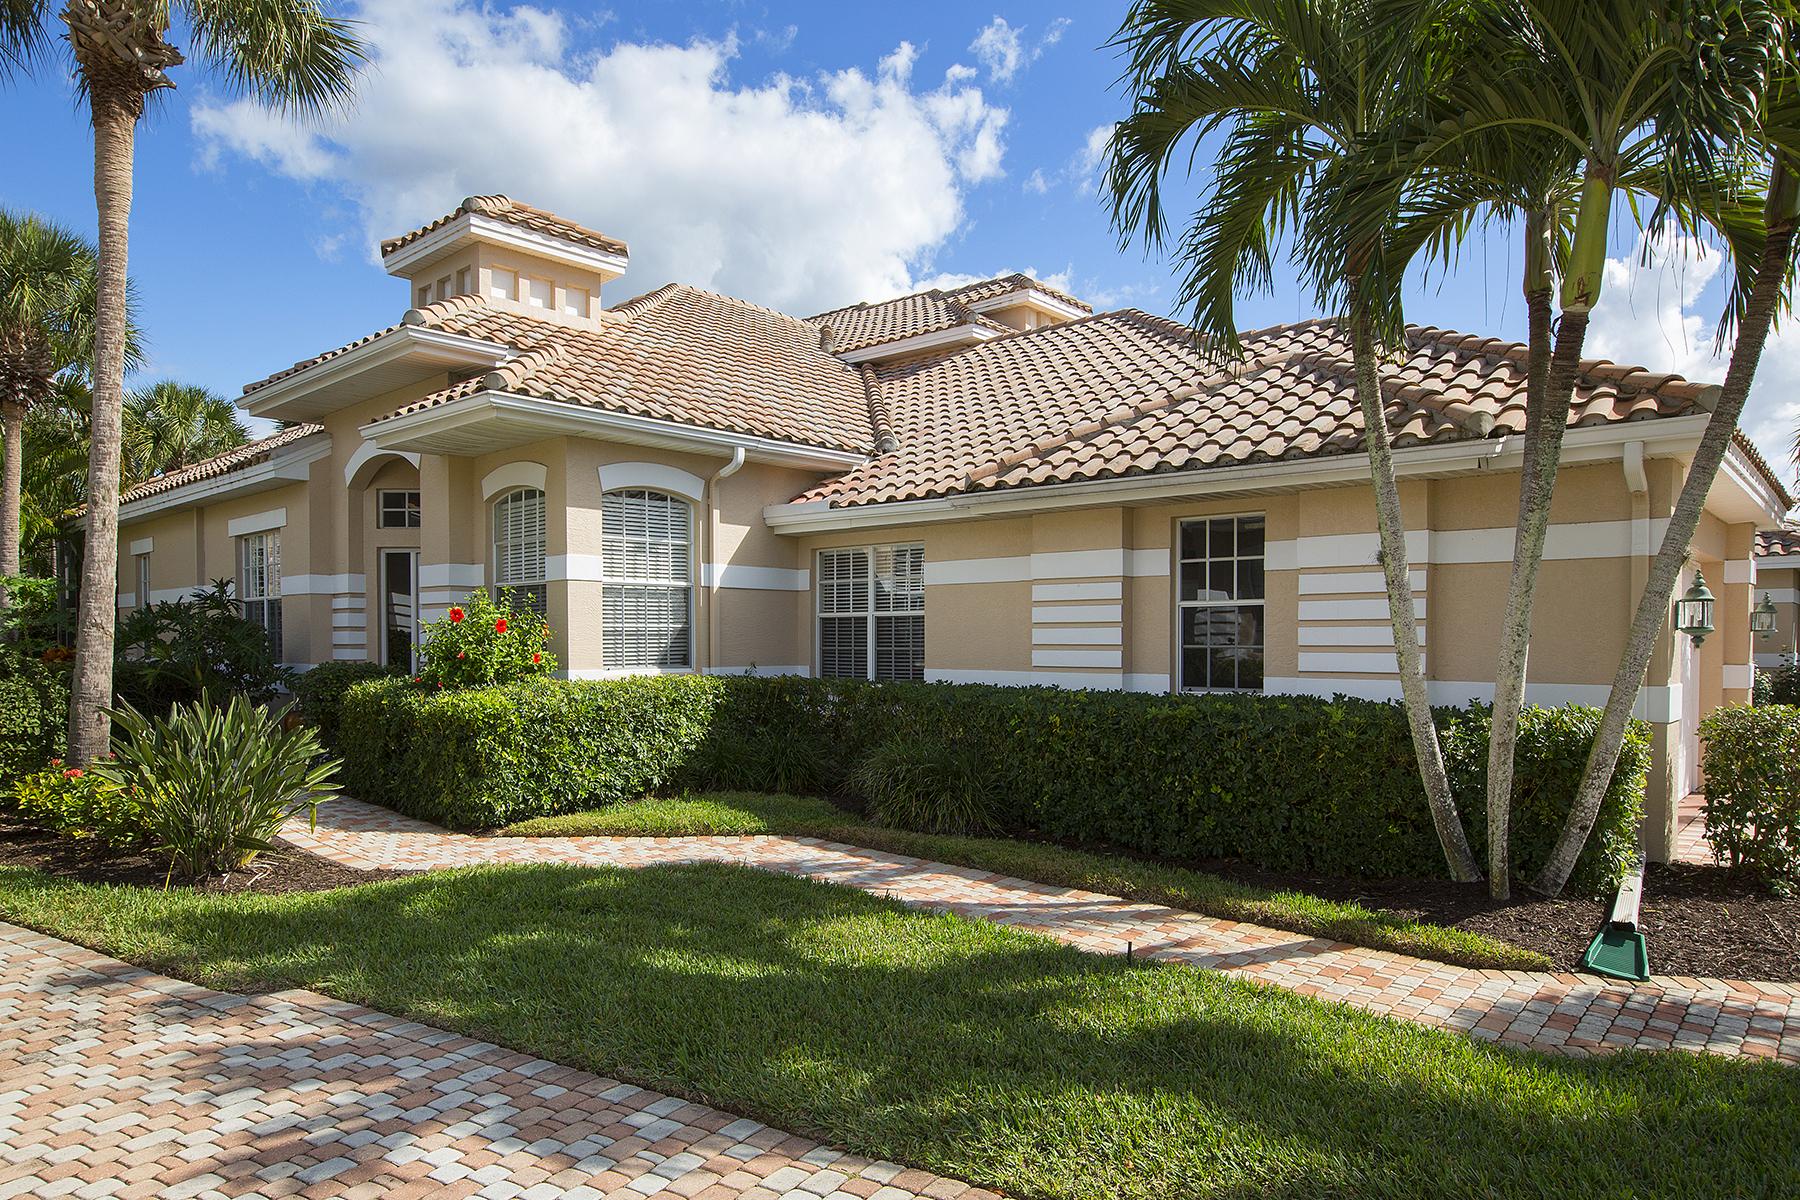 Townhouse for Sale at PELICAN LANDING - BAYCREST 25454 Galashields Cir, Bonita Springs, Florida 34134 United States